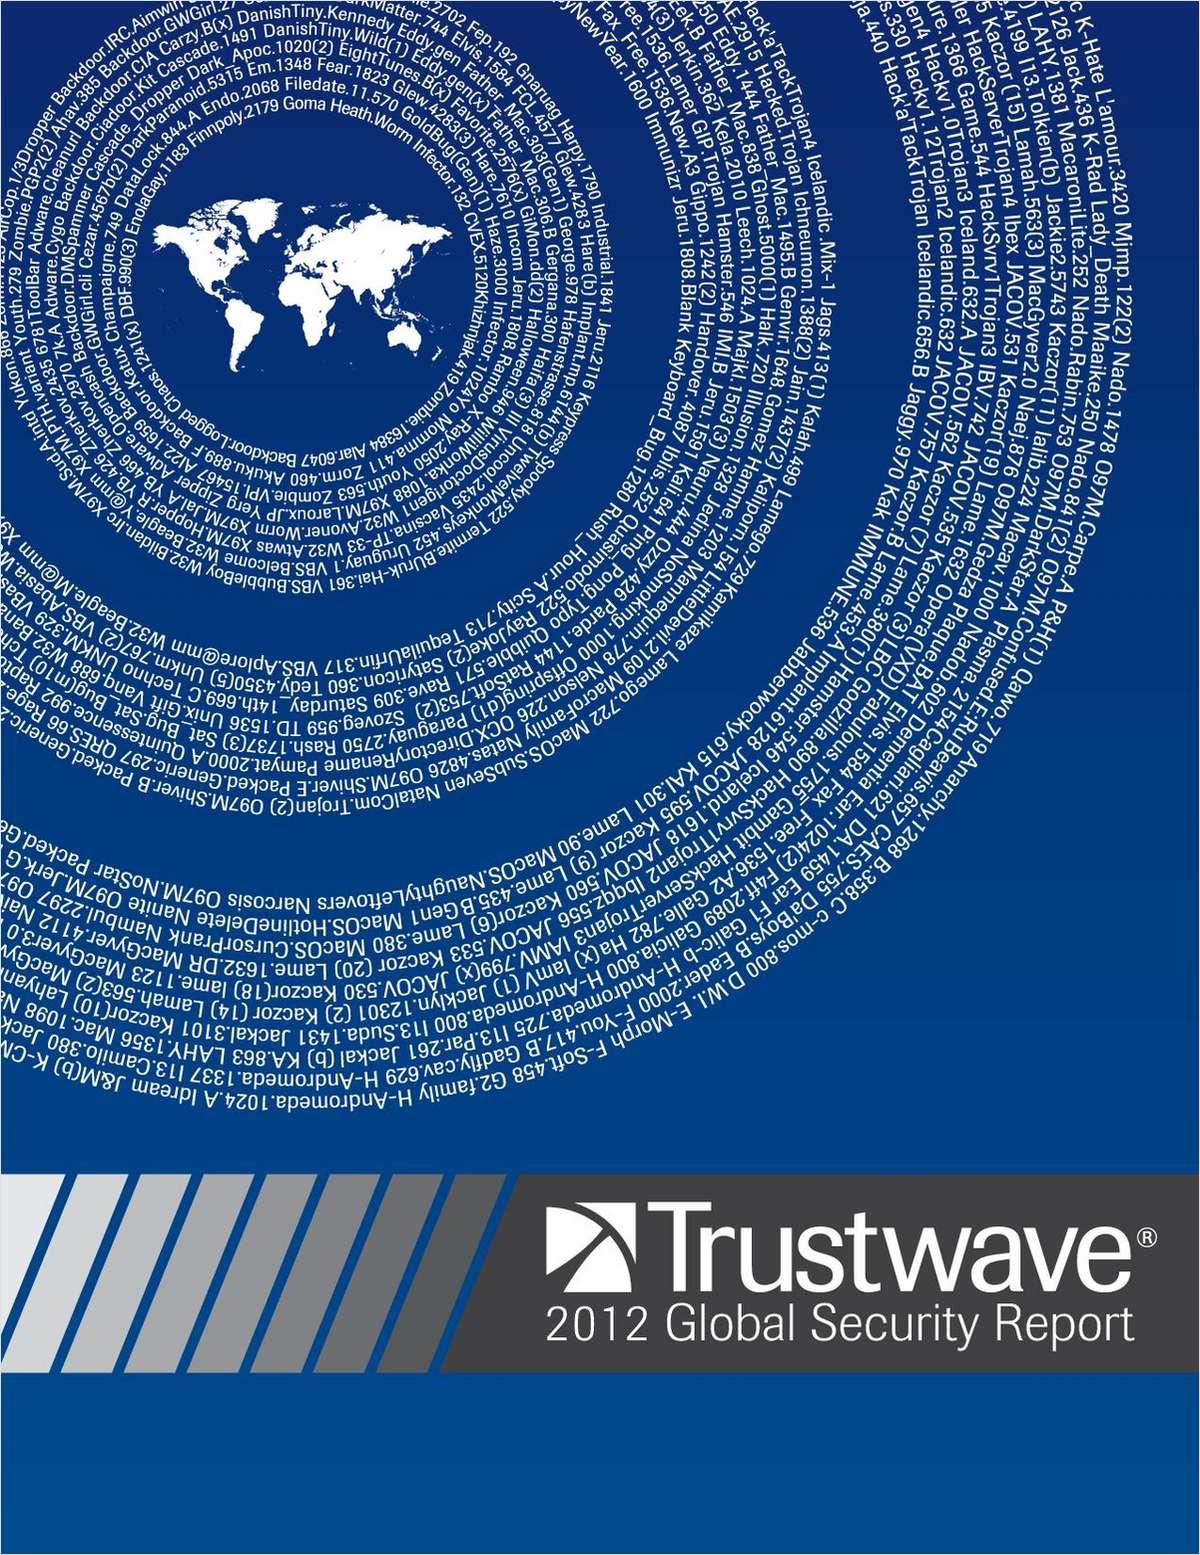 Trustwave 2012 Global Security Report